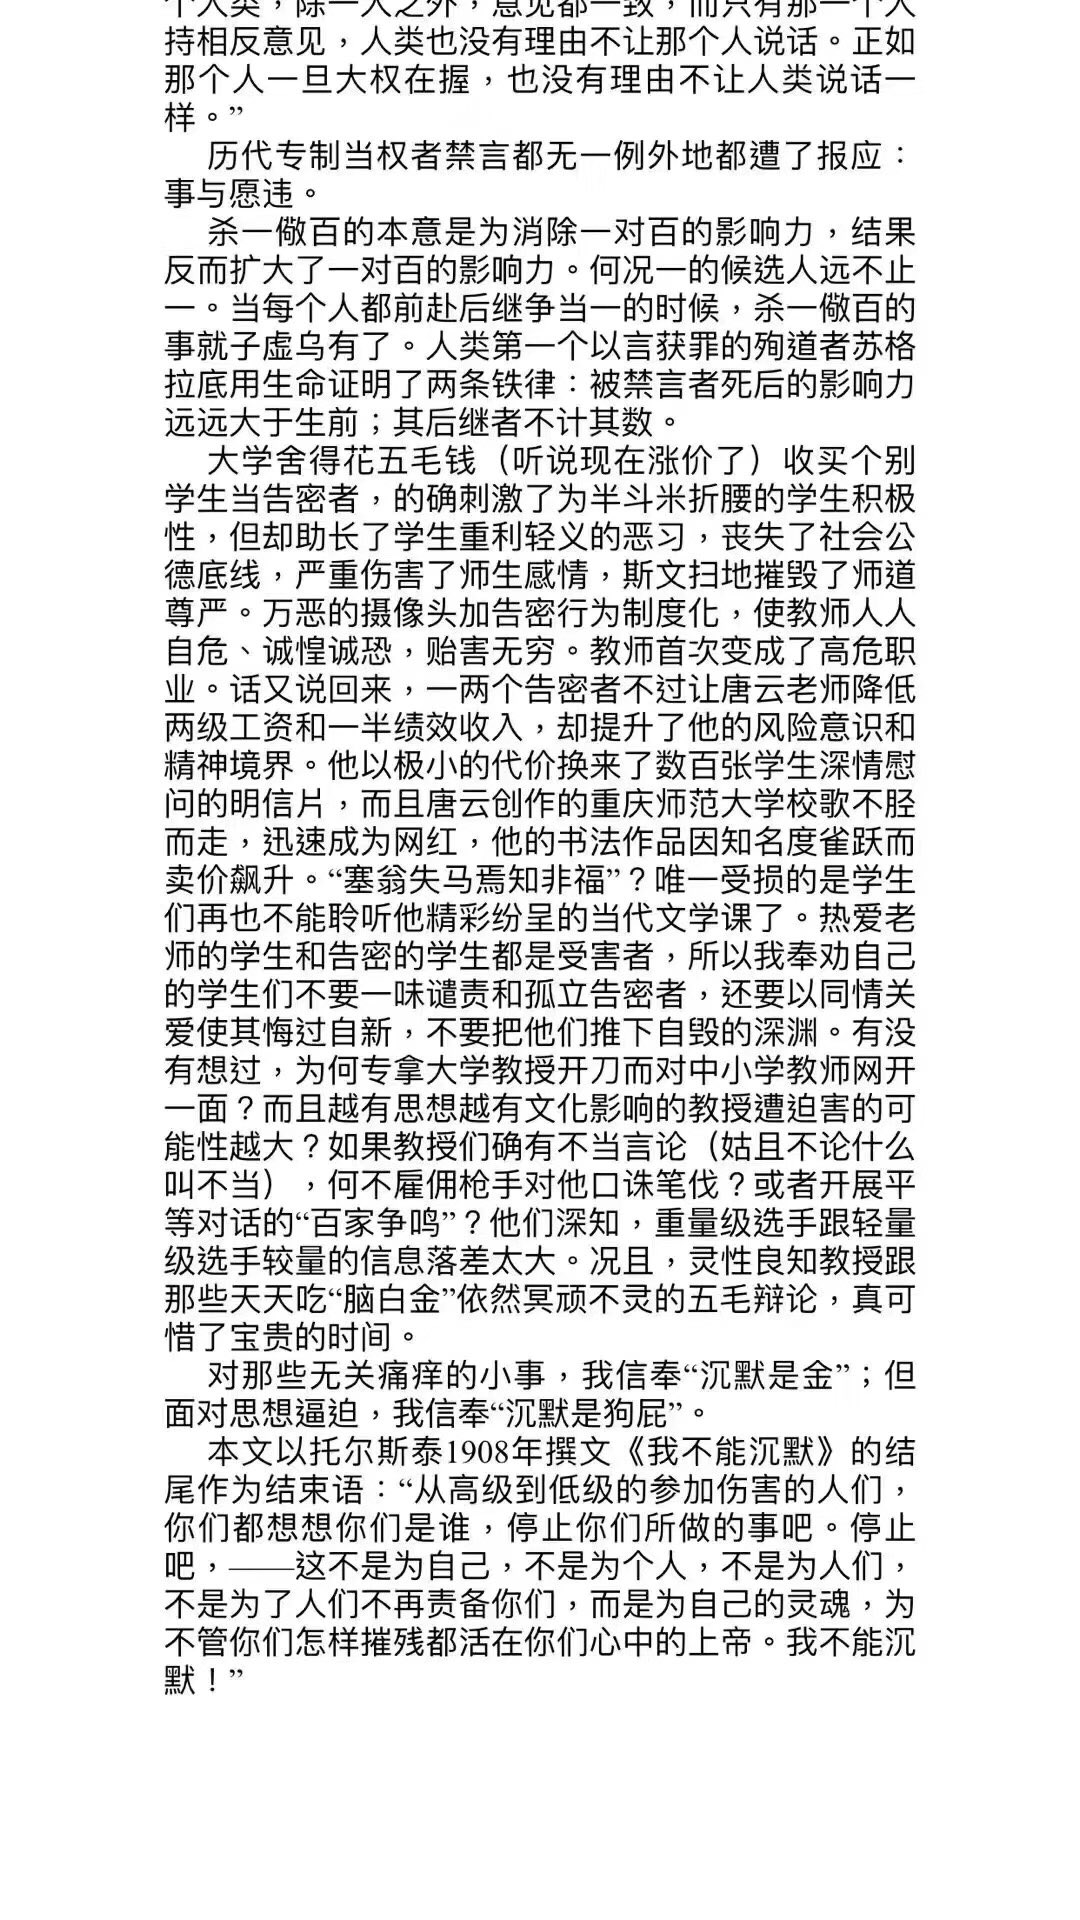 https://pbs.twimg.com/media/D2_xoB5UYAAb928?format=jpg&name=orig